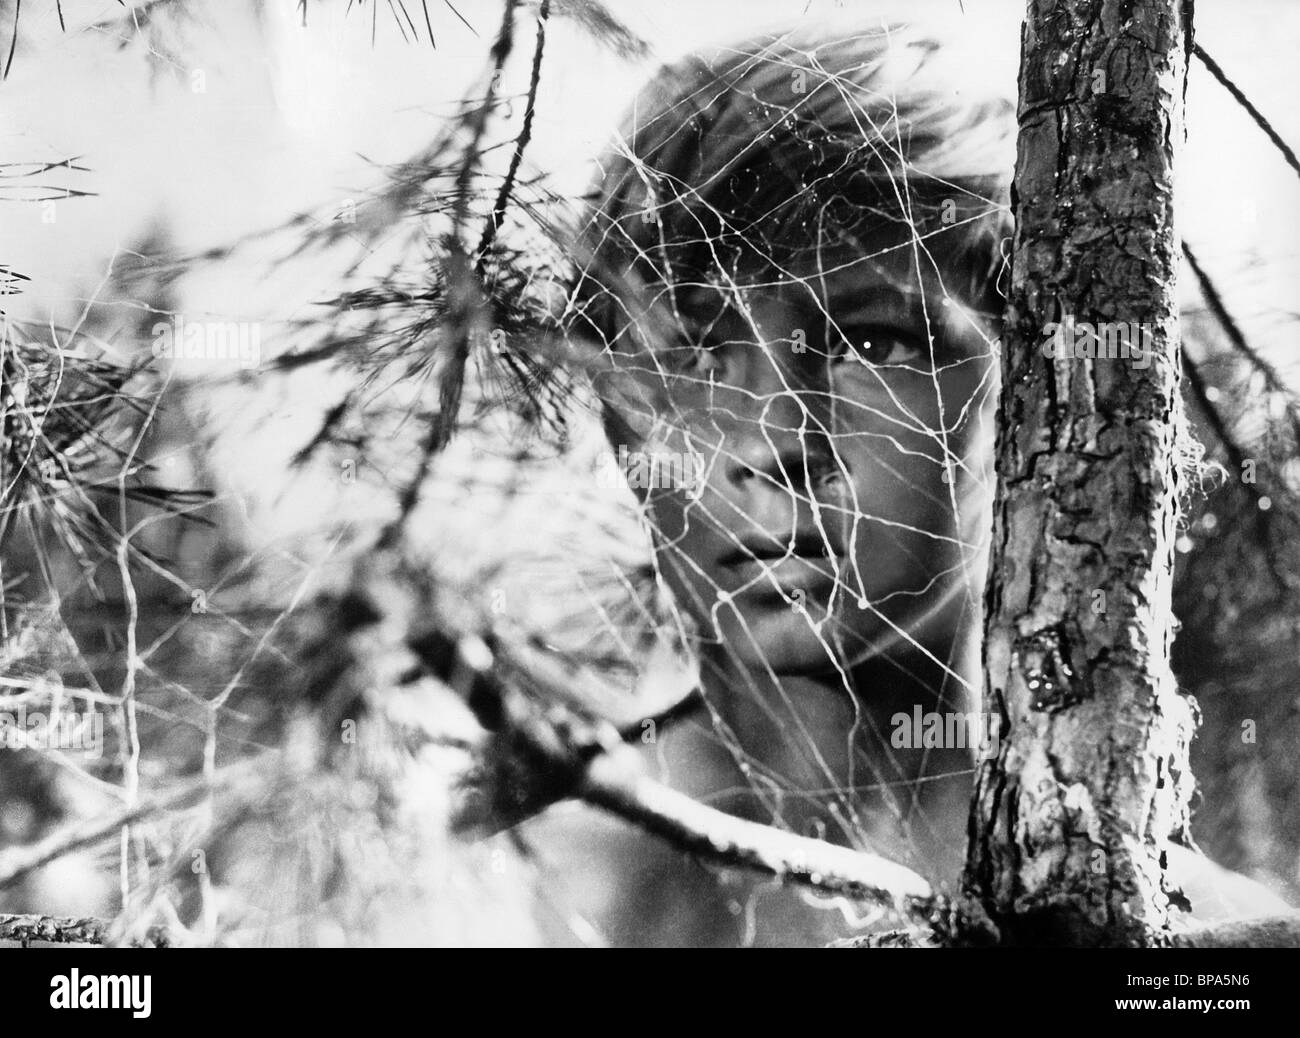 NIKOLAI BURLYAYEV MY NAME IS IVAN; CHILDHOOD OF IVAN; IVAN'S CHILDHOOD; THE YOUNGEST SPY; IVANOVO DETSTVO (1962) Stock Photo